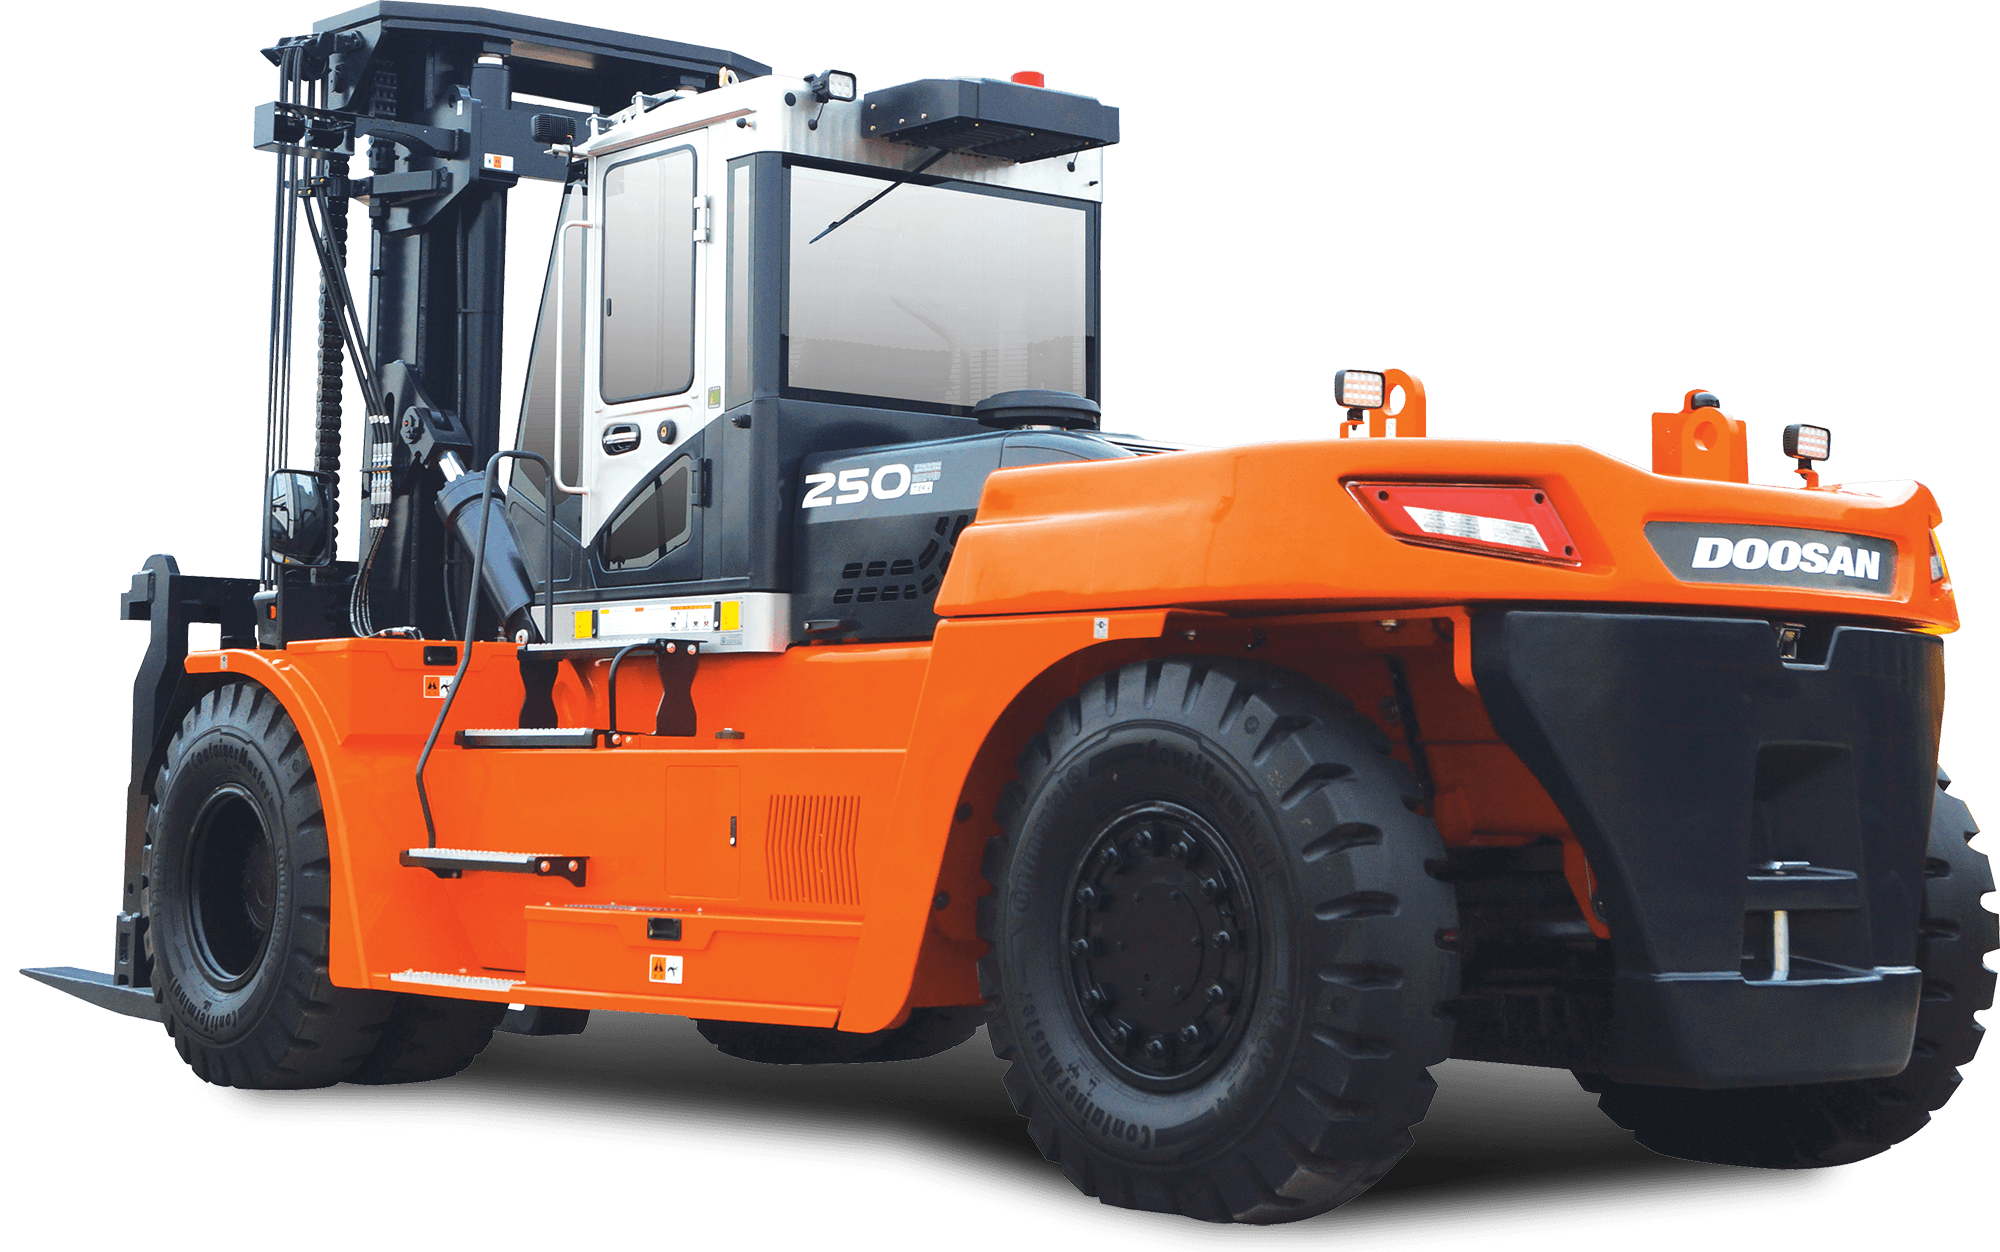 Doosan 25.0 Tonne Diesel Forklift Truck